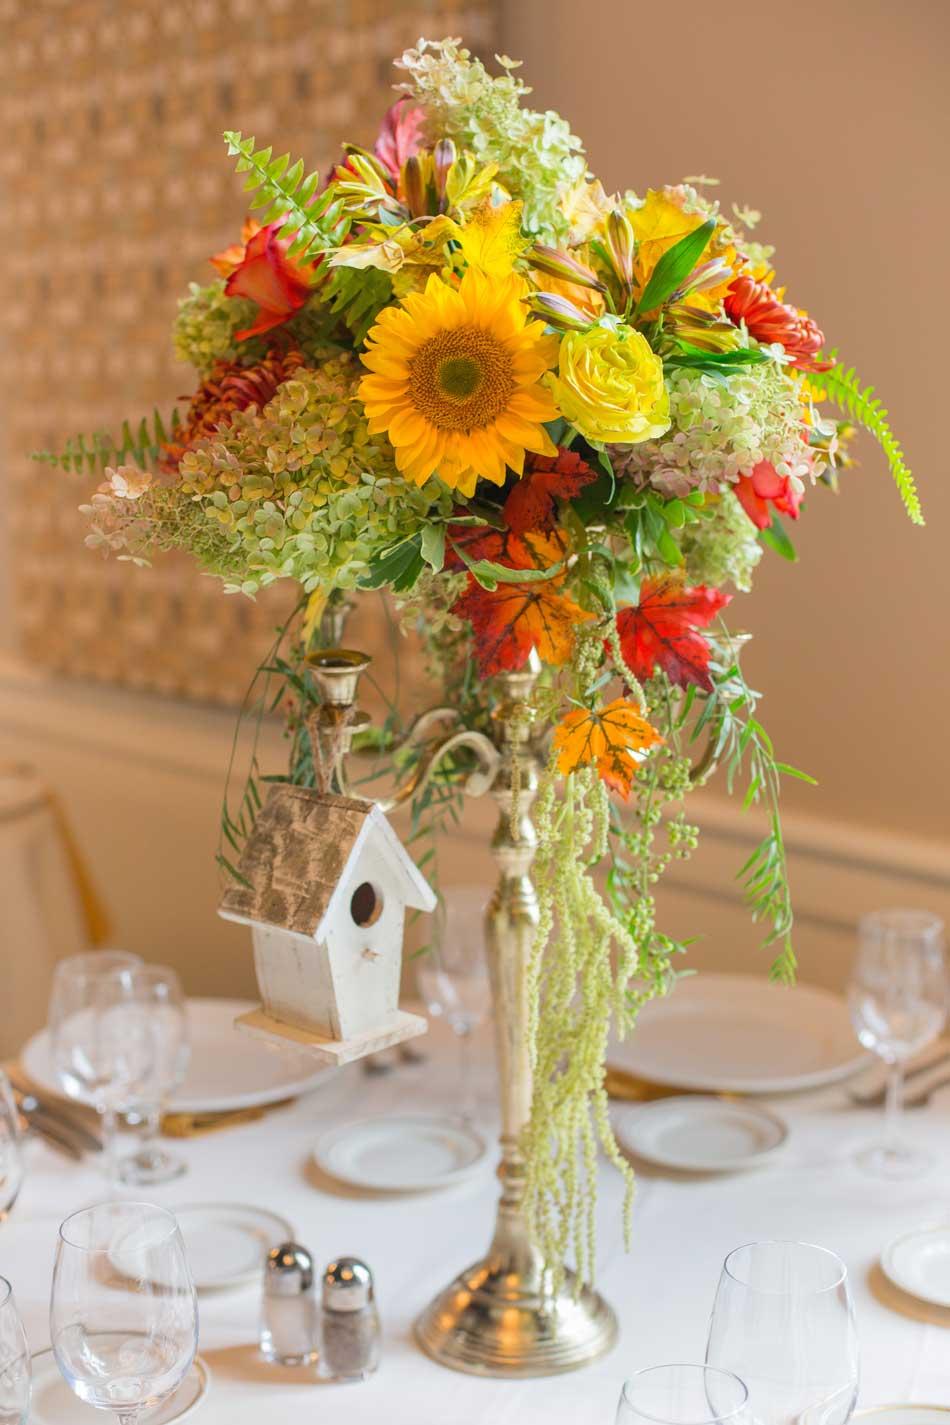 Birdhouse Themed Floral Reception Centerpieces